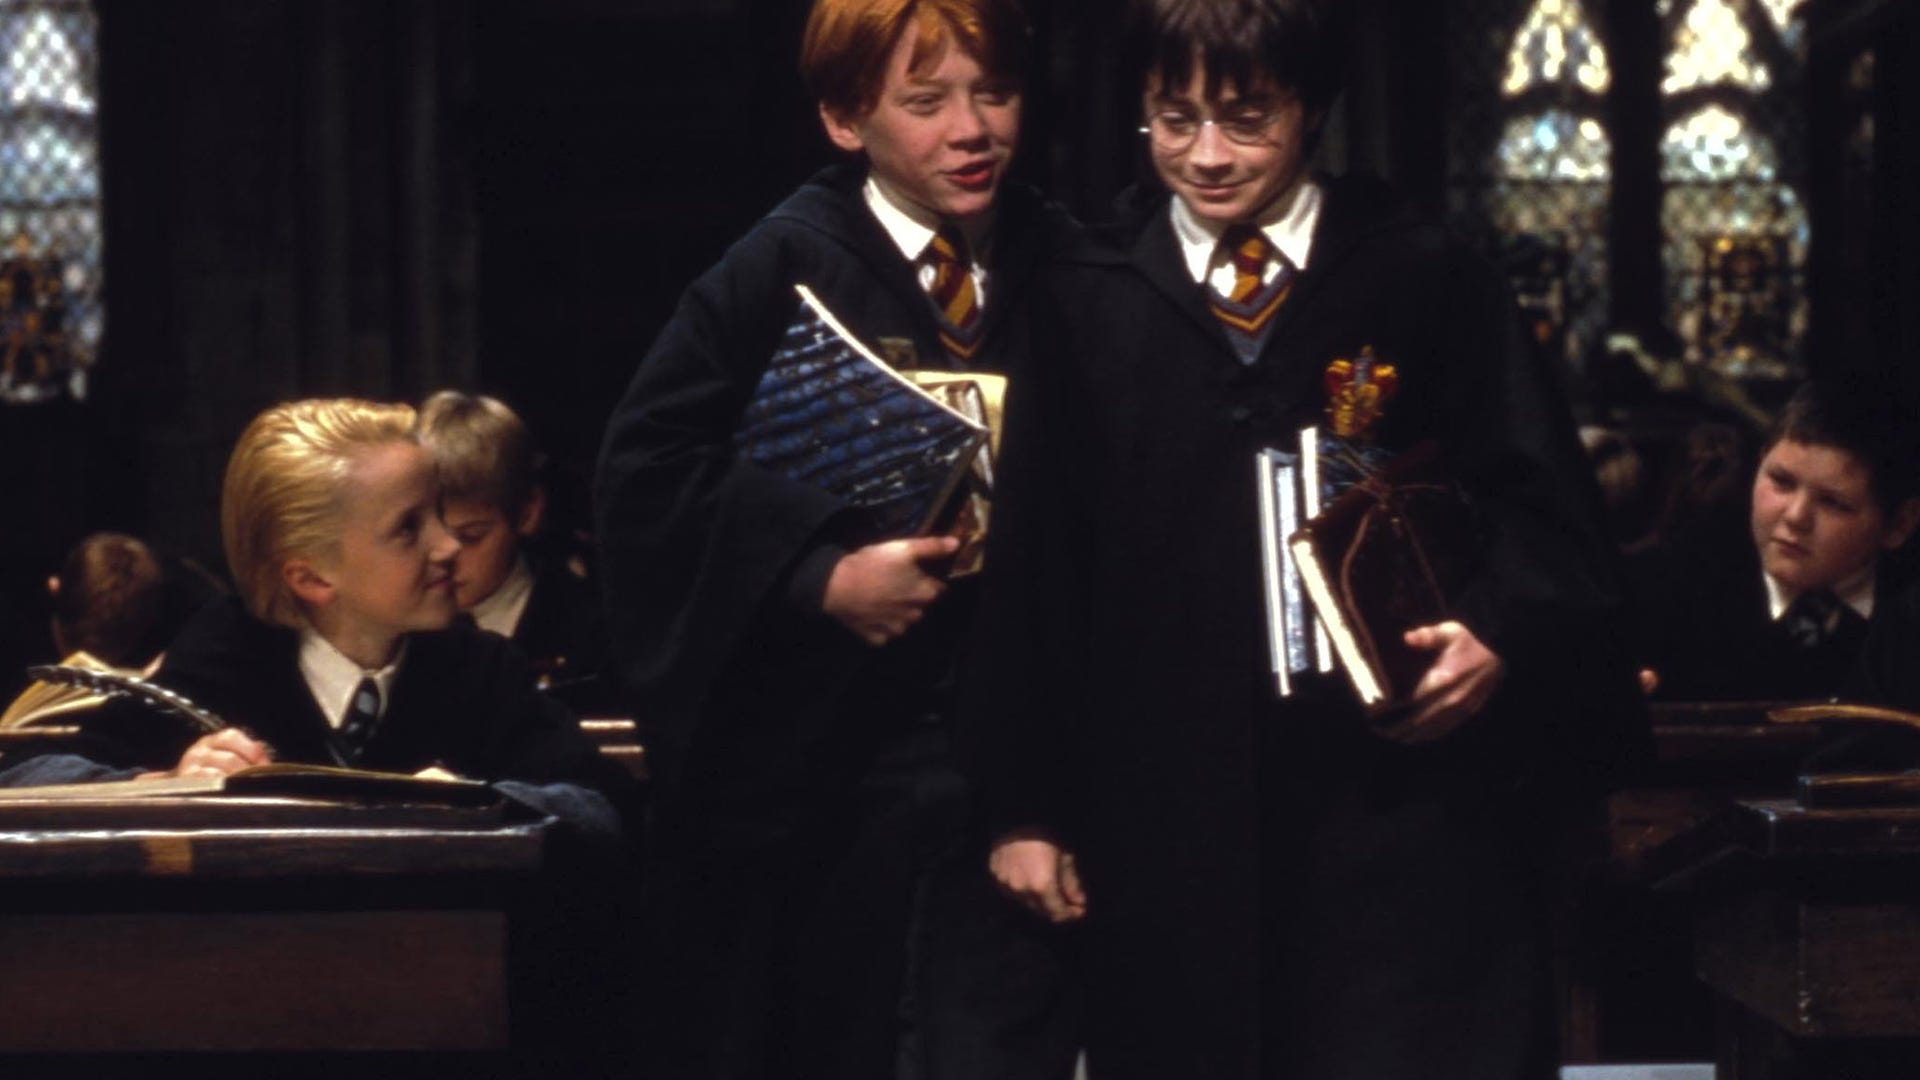 Daniel Radcliffe and Rupert Grint, Harry Potter